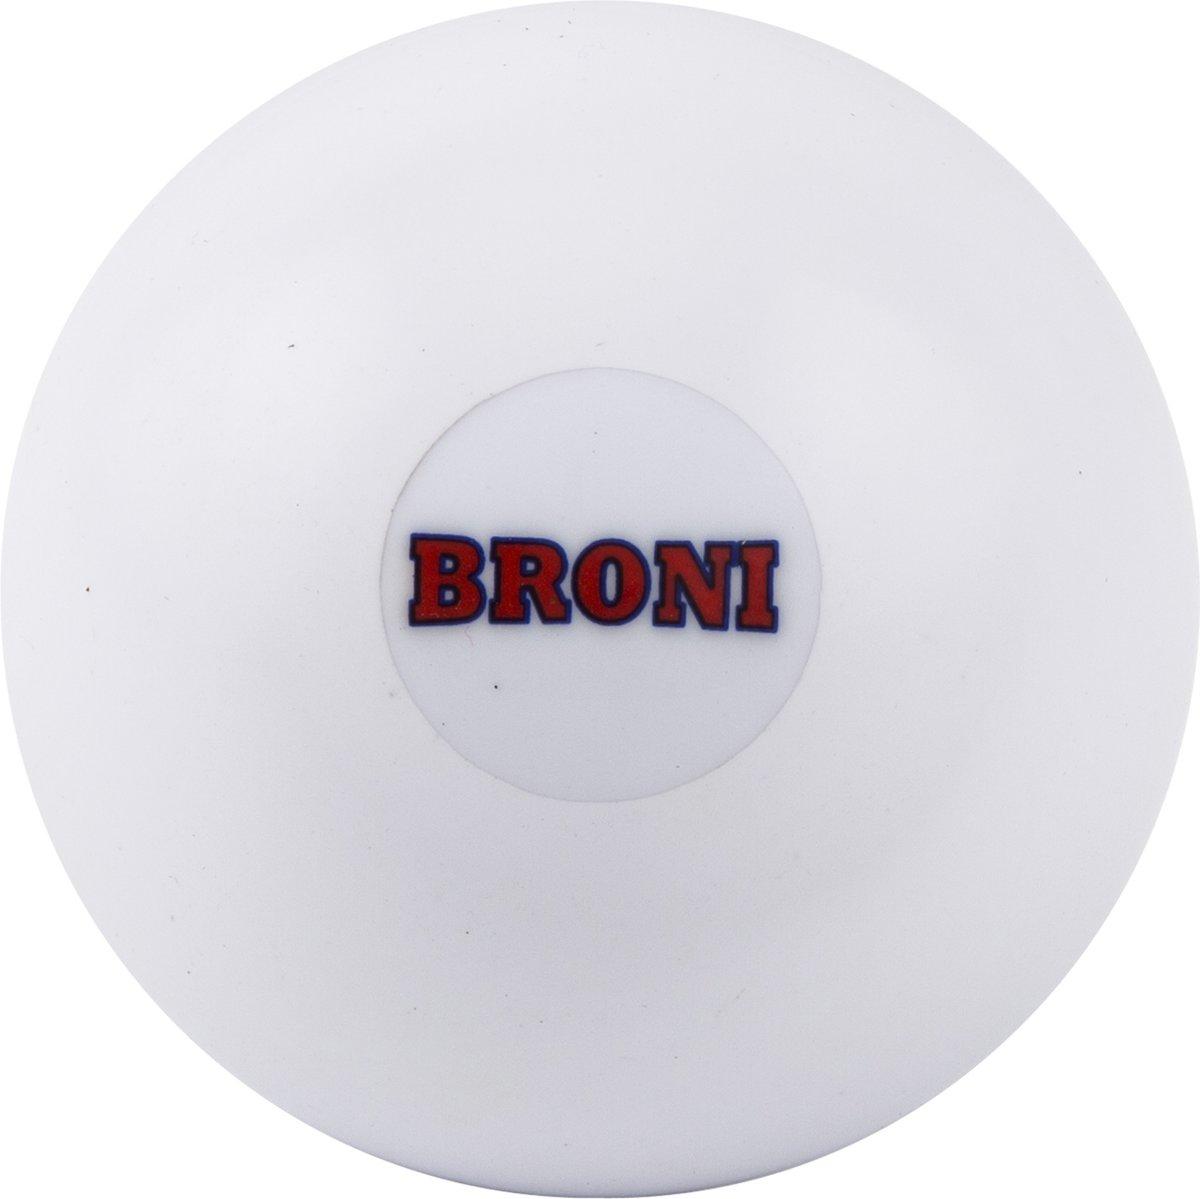 Hockeybal Broni glad - wit kopen